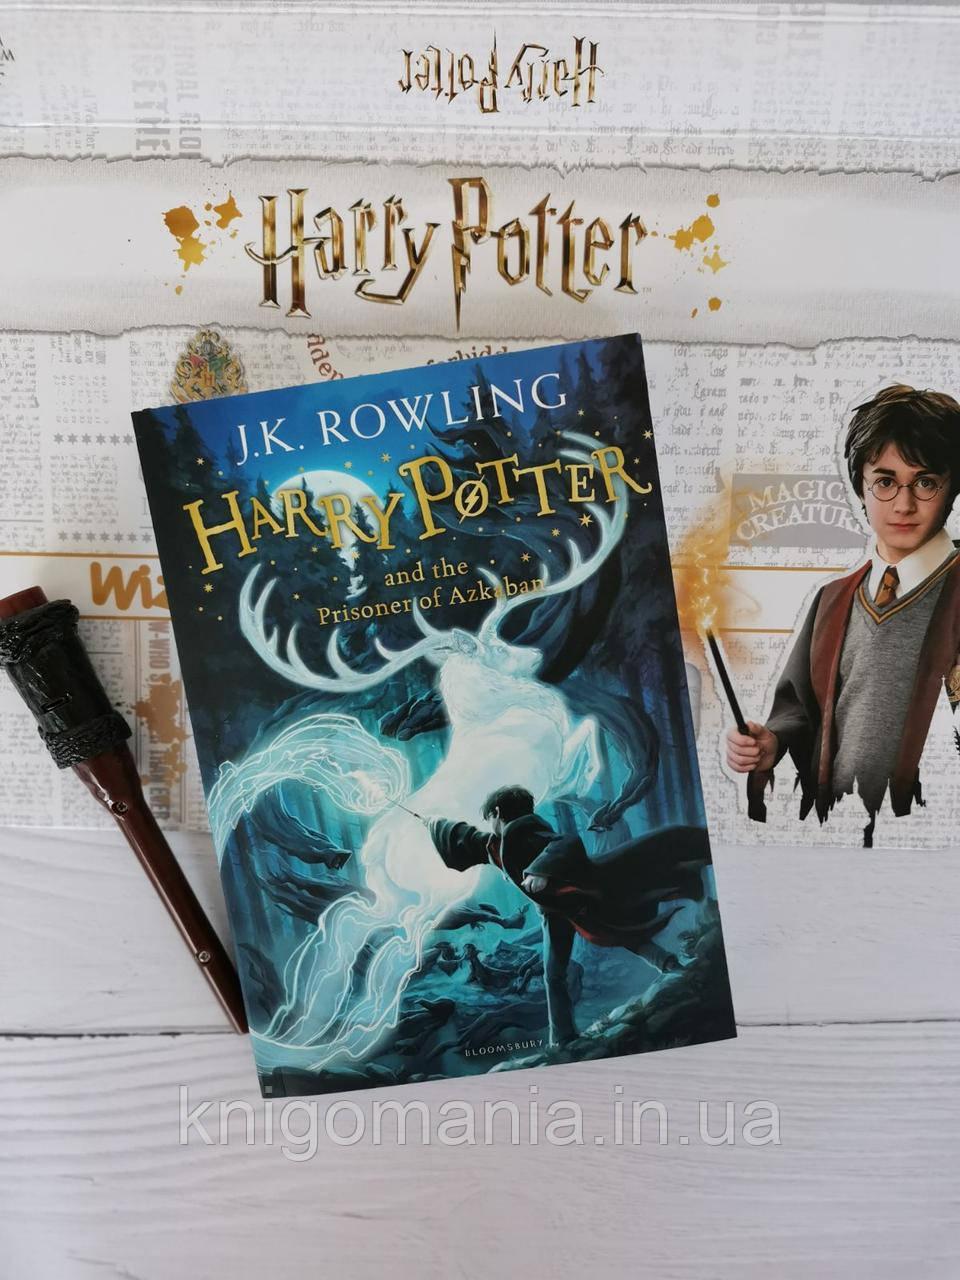 Harry Potter and the Prisoner of Azkaban. J. K. Rowling / Гаррі Поттер і в'язень Азкабану. Дж.До. Роулінг